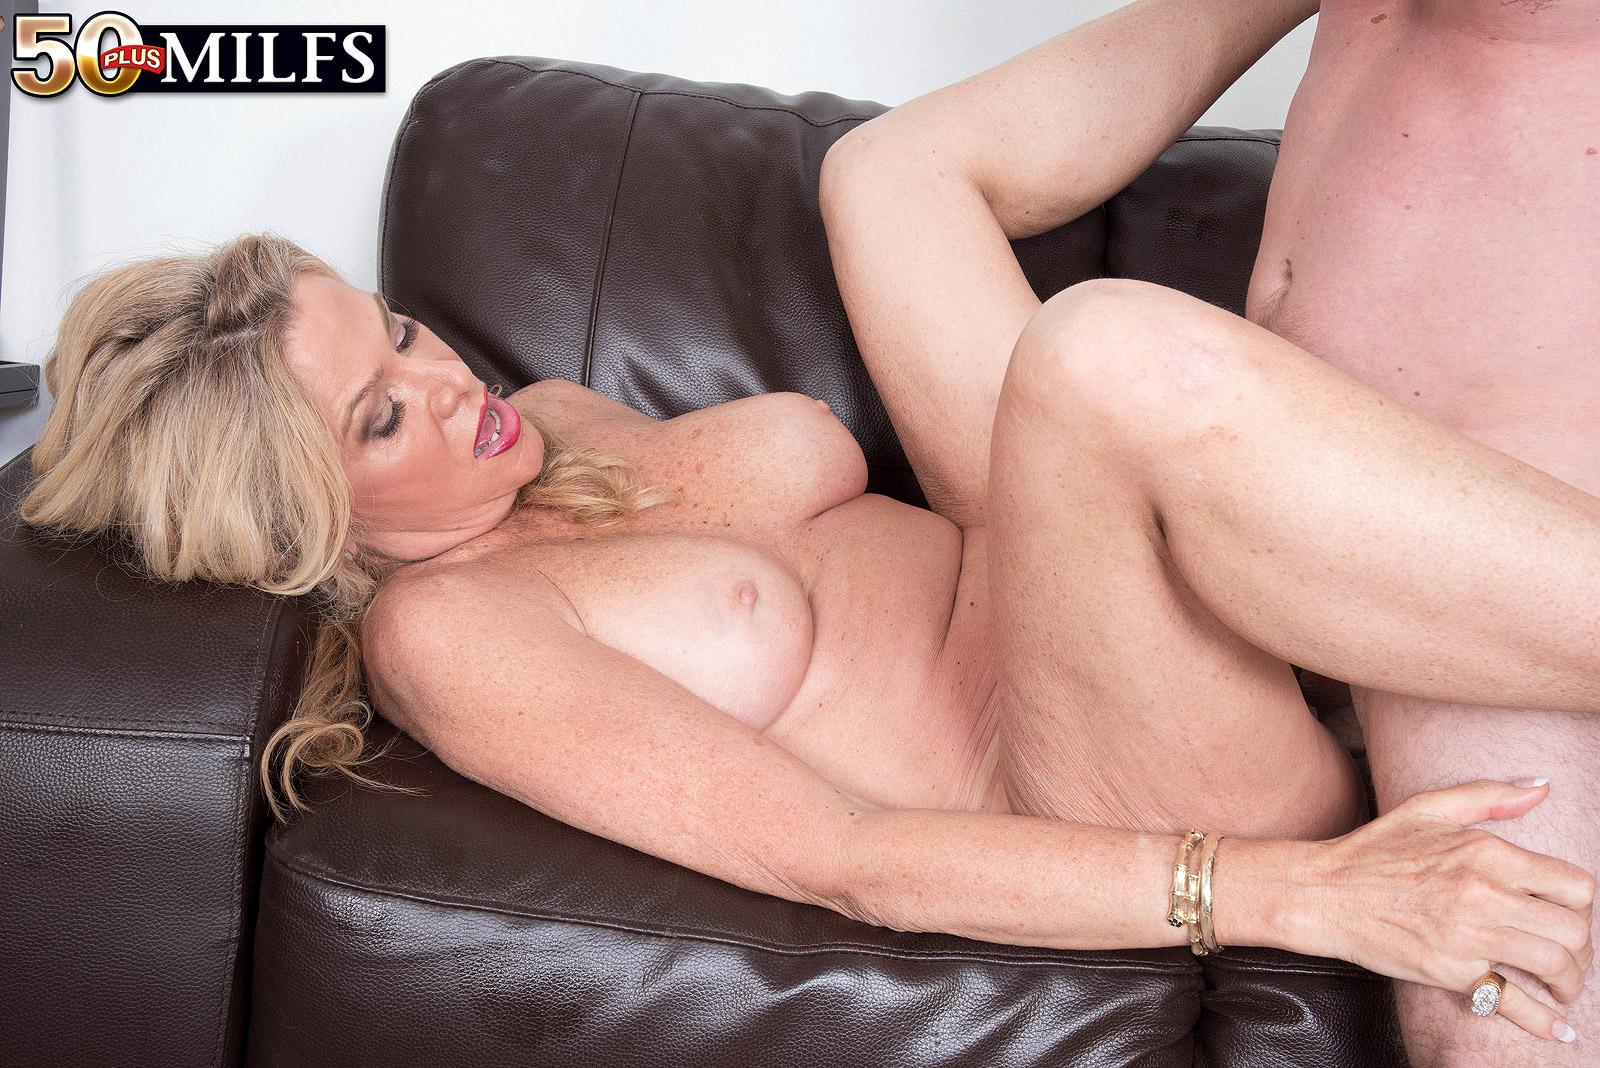 Sophia loren nude free pics